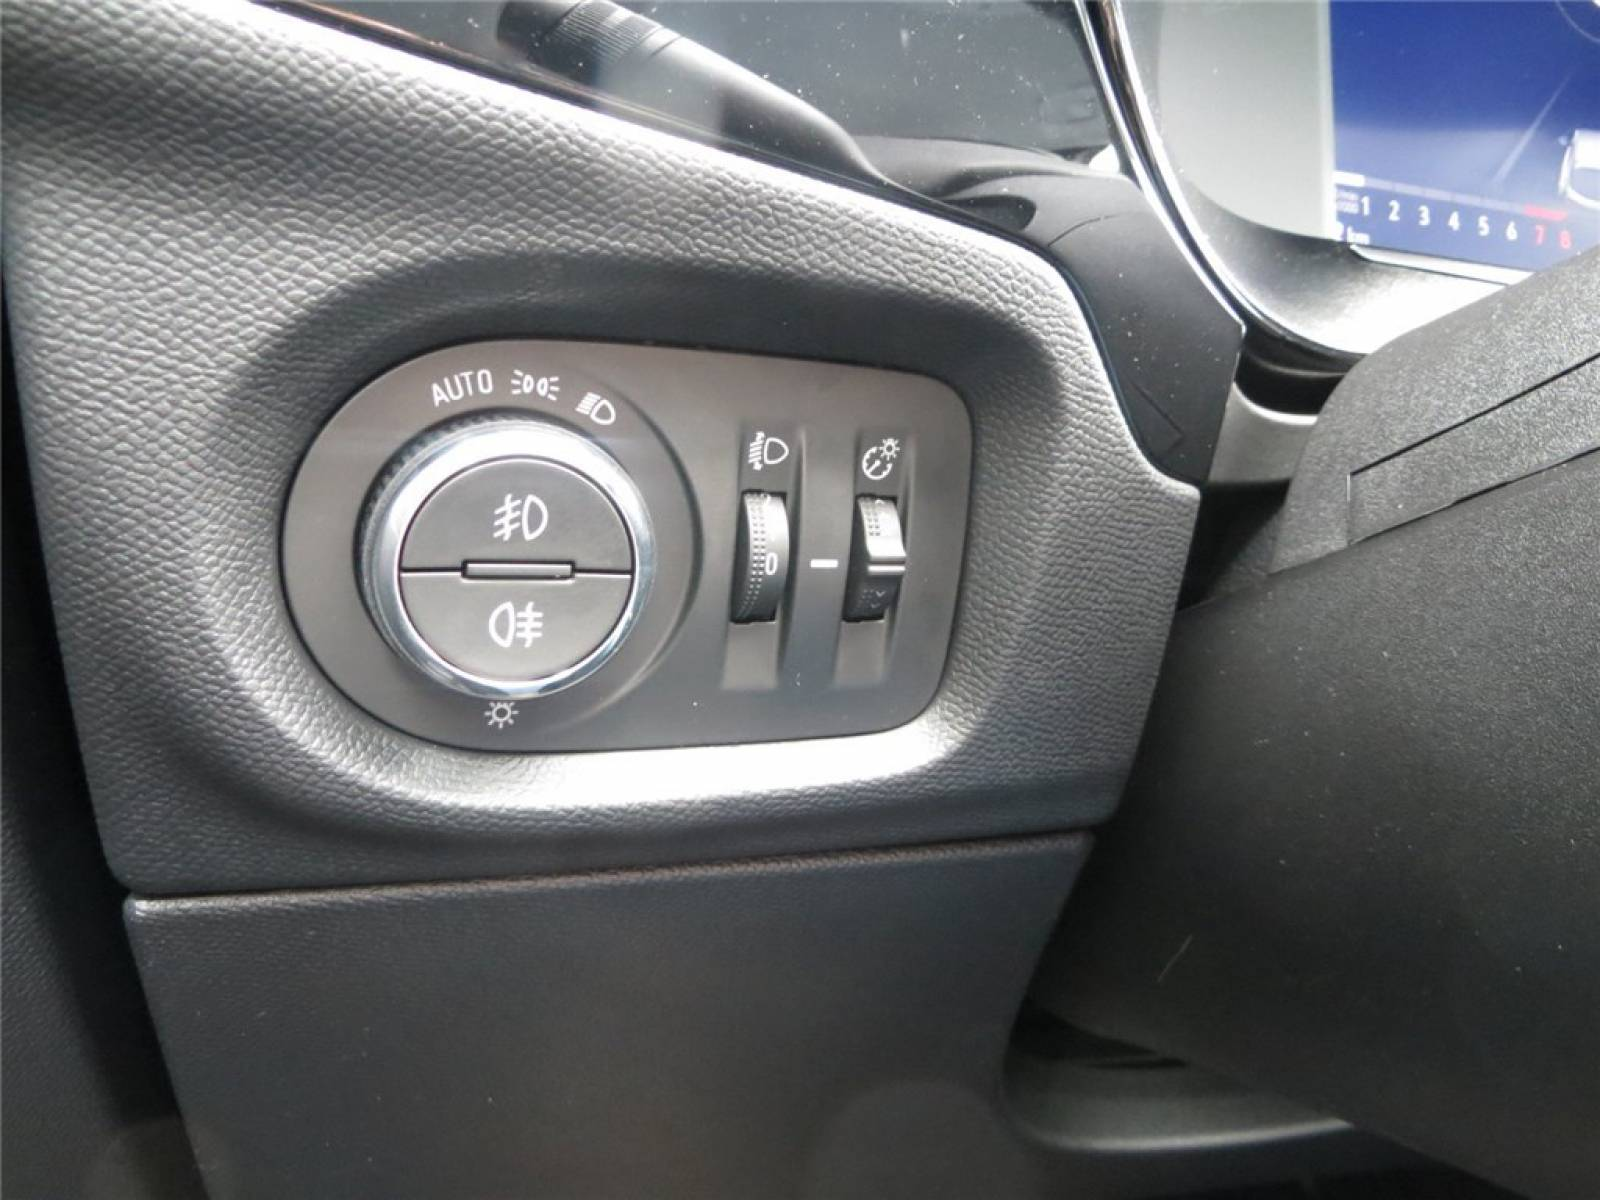 OPEL Corsa 1.2 Turbo 100 ch BVM6 - véhicule d'occasion - Groupe Guillet - Opel Magicauto - Chalon-sur-Saône - 71380 - Saint-Marcel - 15